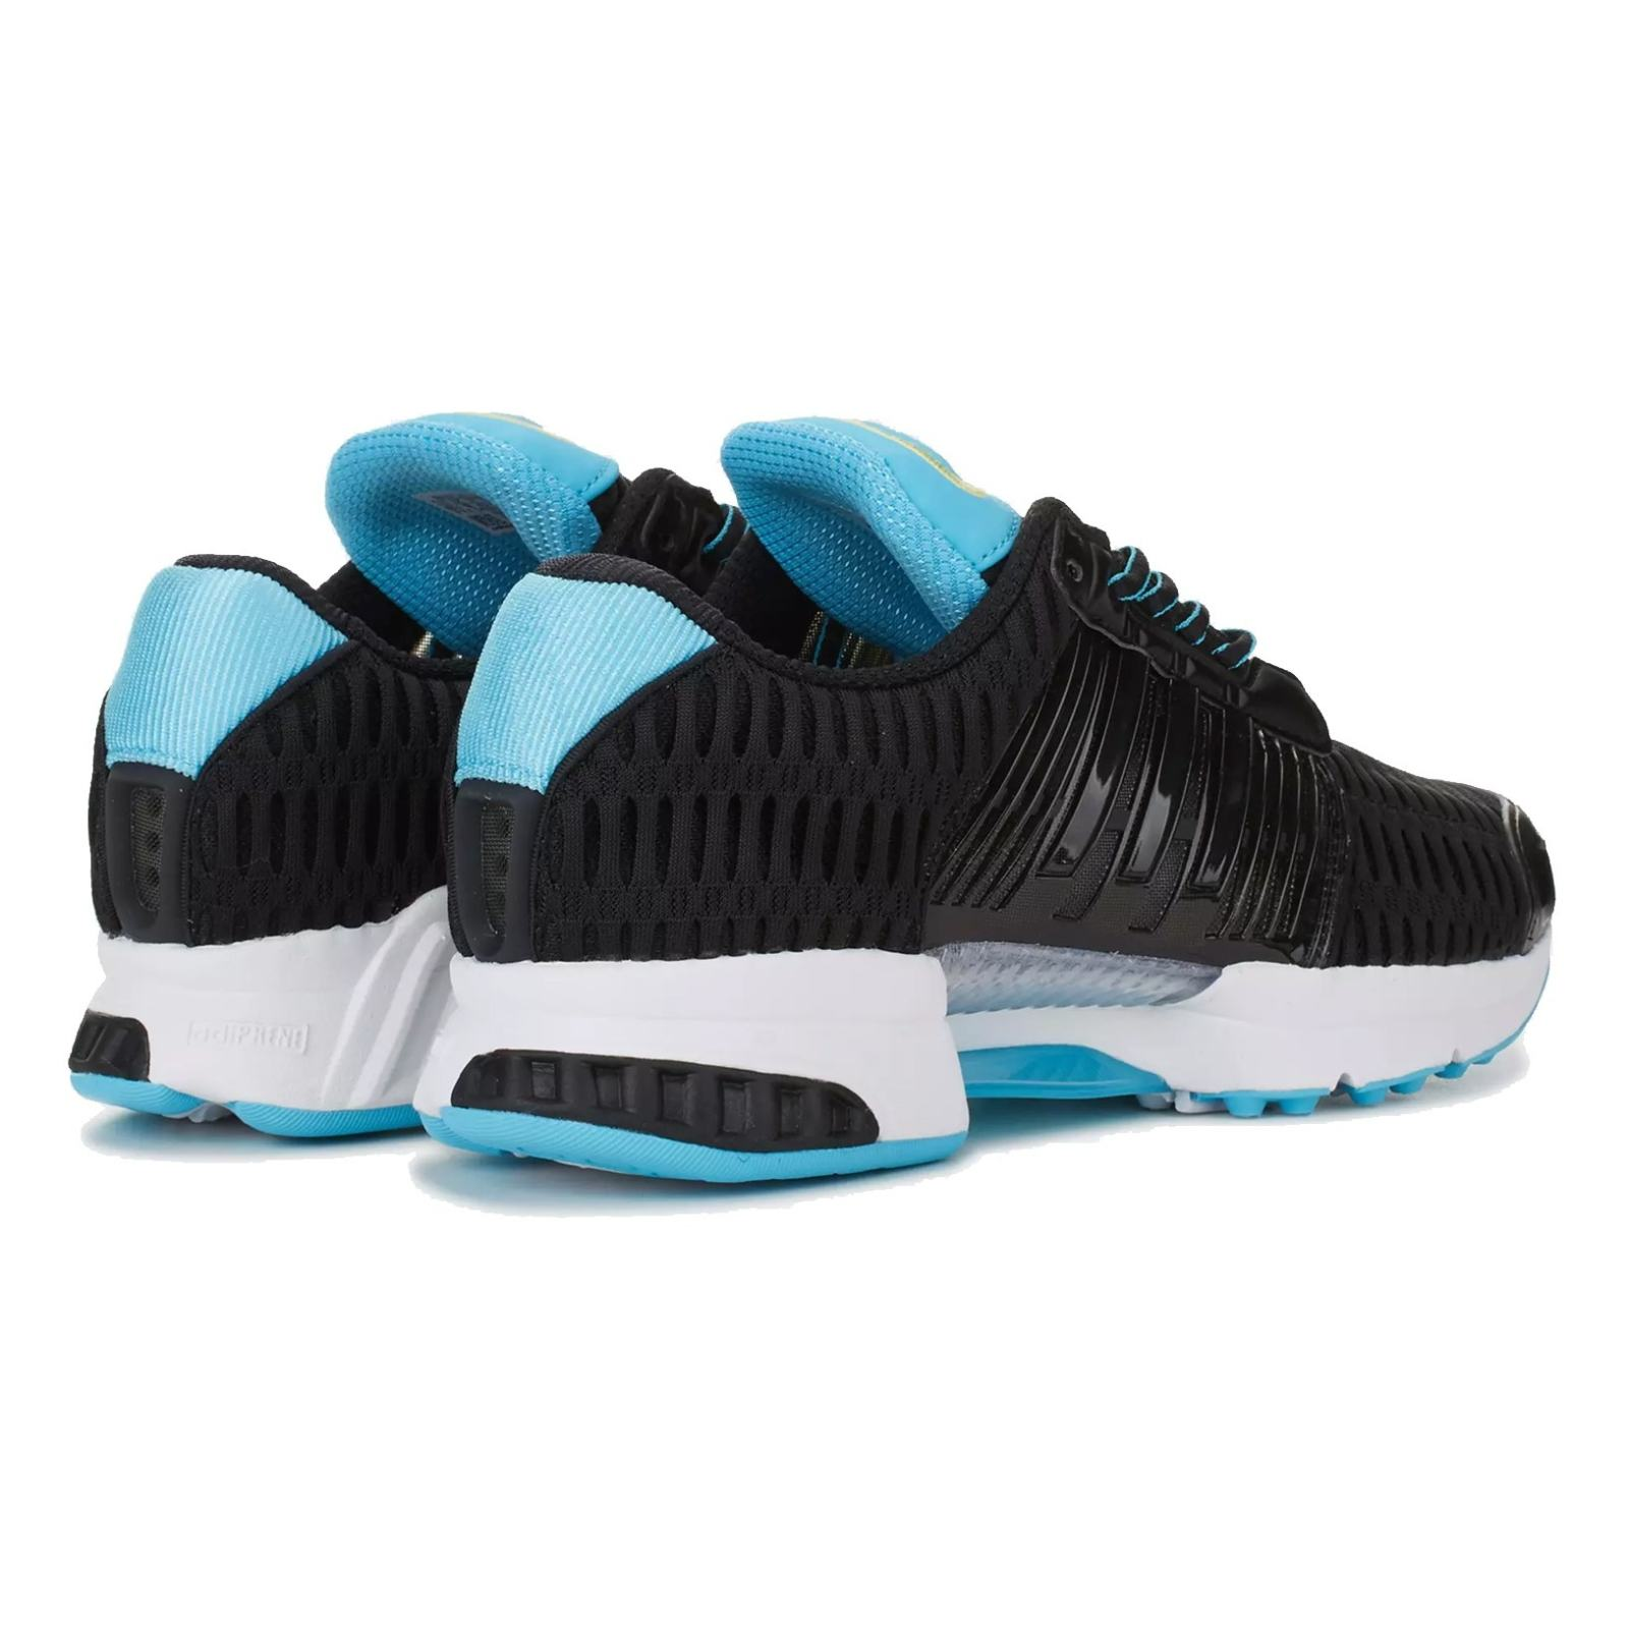 کفش پیاده روی بندی مردانه Climacool 1 - آدیداس - مشکی - 5